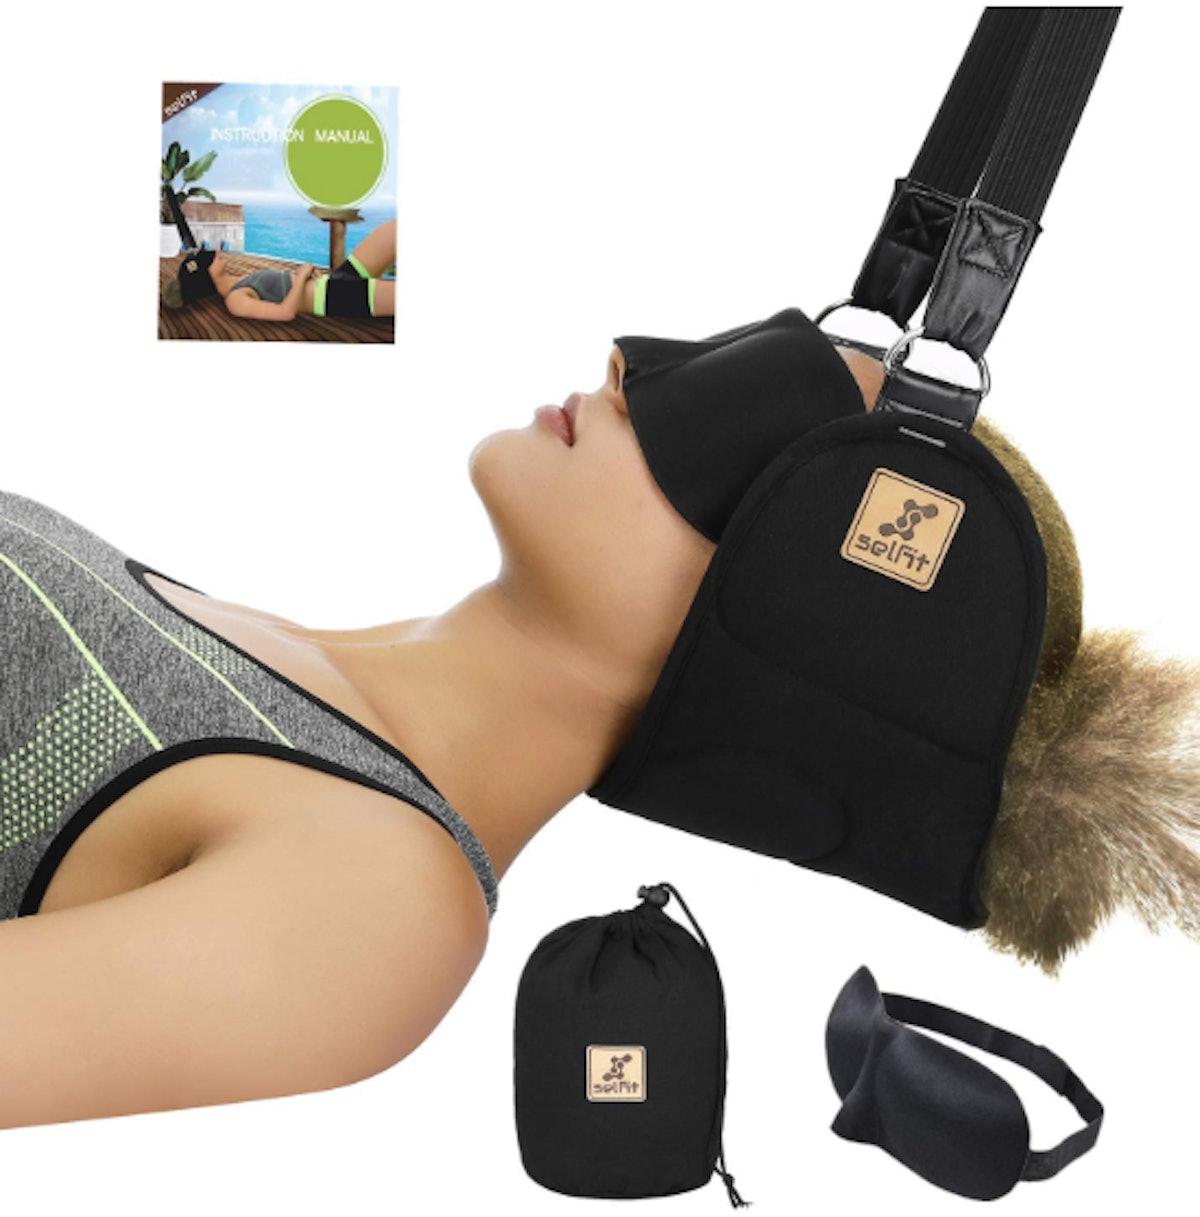 SELFIT Portable Head Hammock